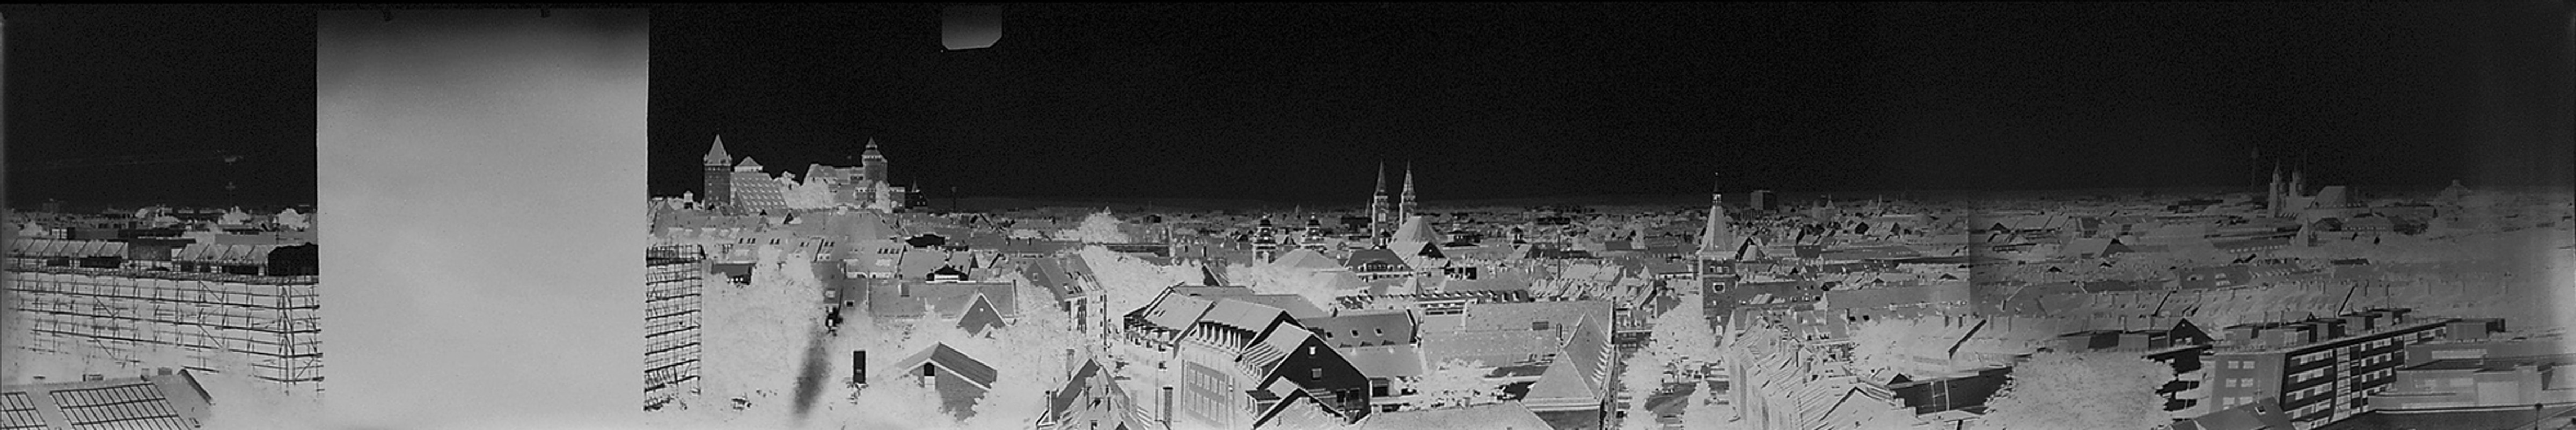 Panorama aus dem Laufertorturm Nürnberg